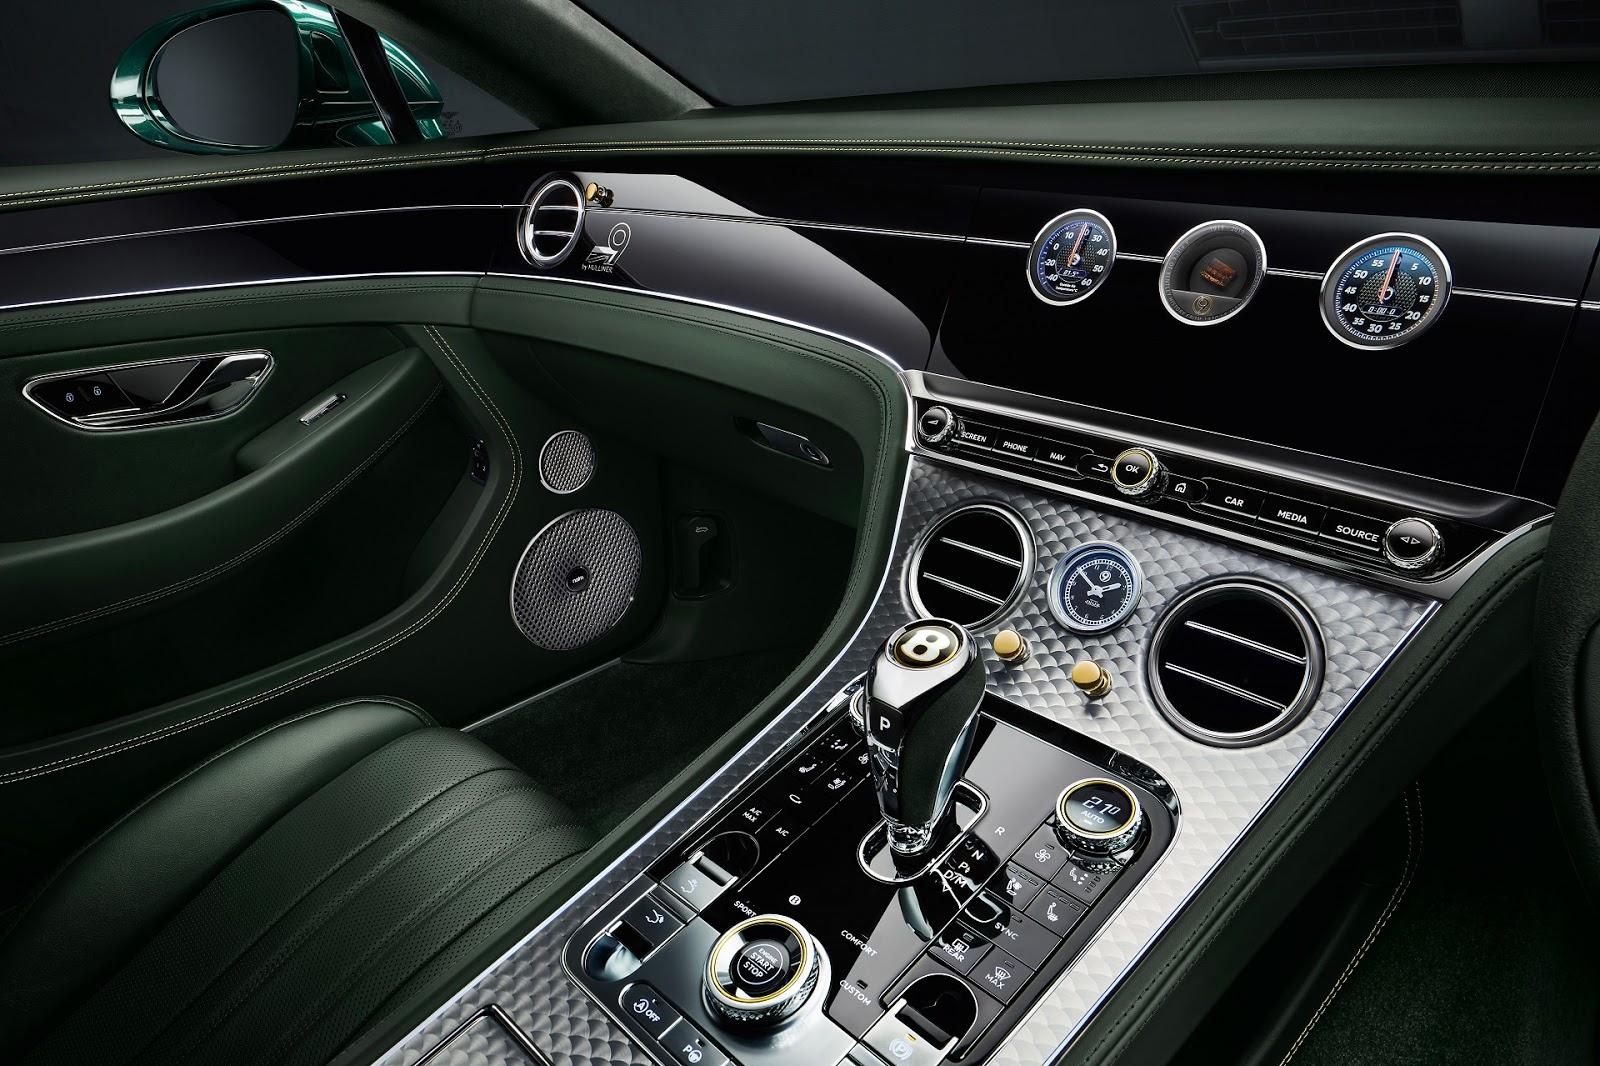 Bentley2BContinental2BGT2BNo2B92Bby2BMulliner2B 2B5